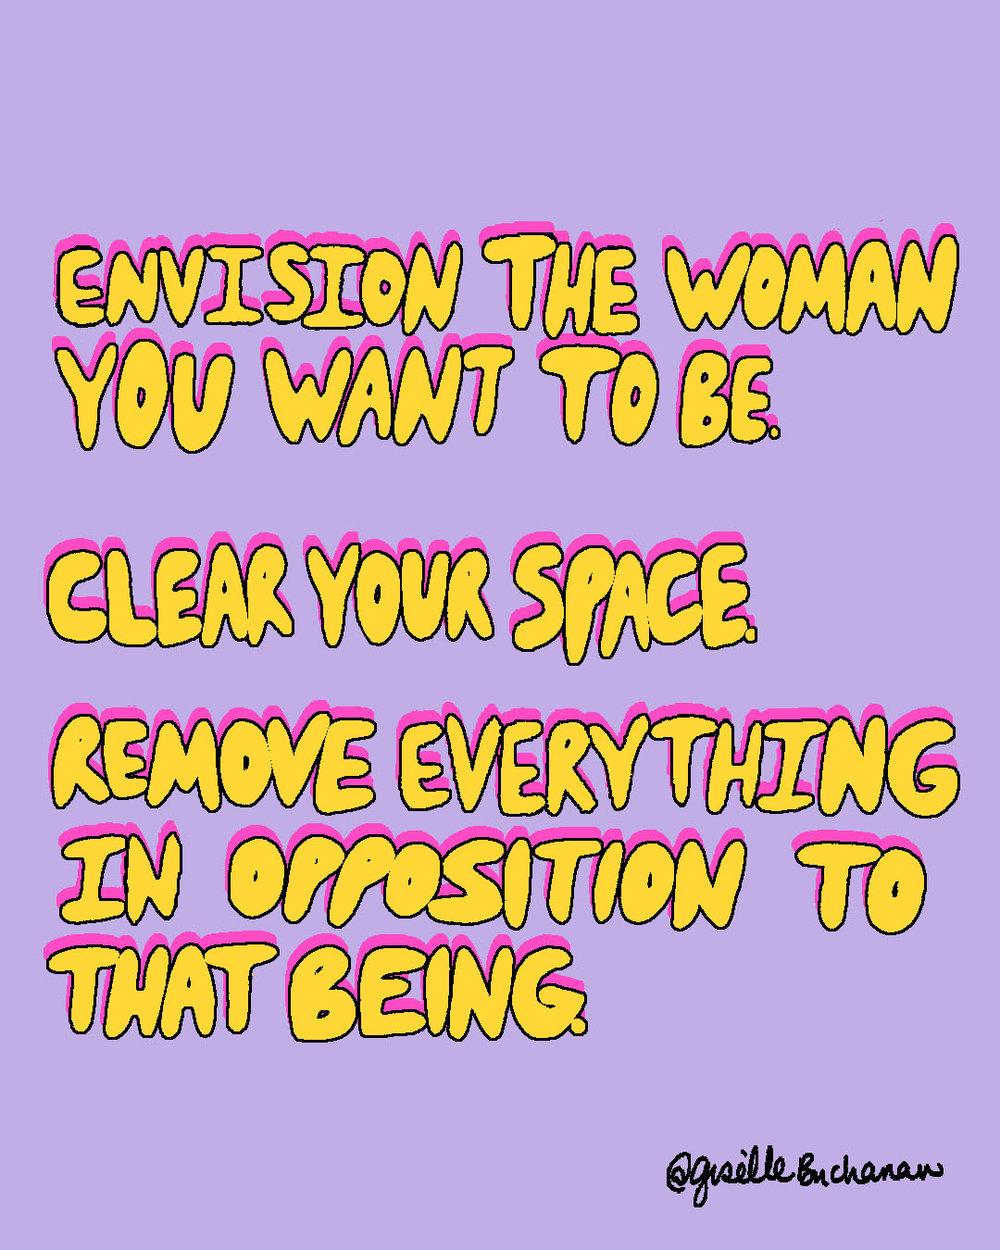 envision-Recoveredfghd.jpg